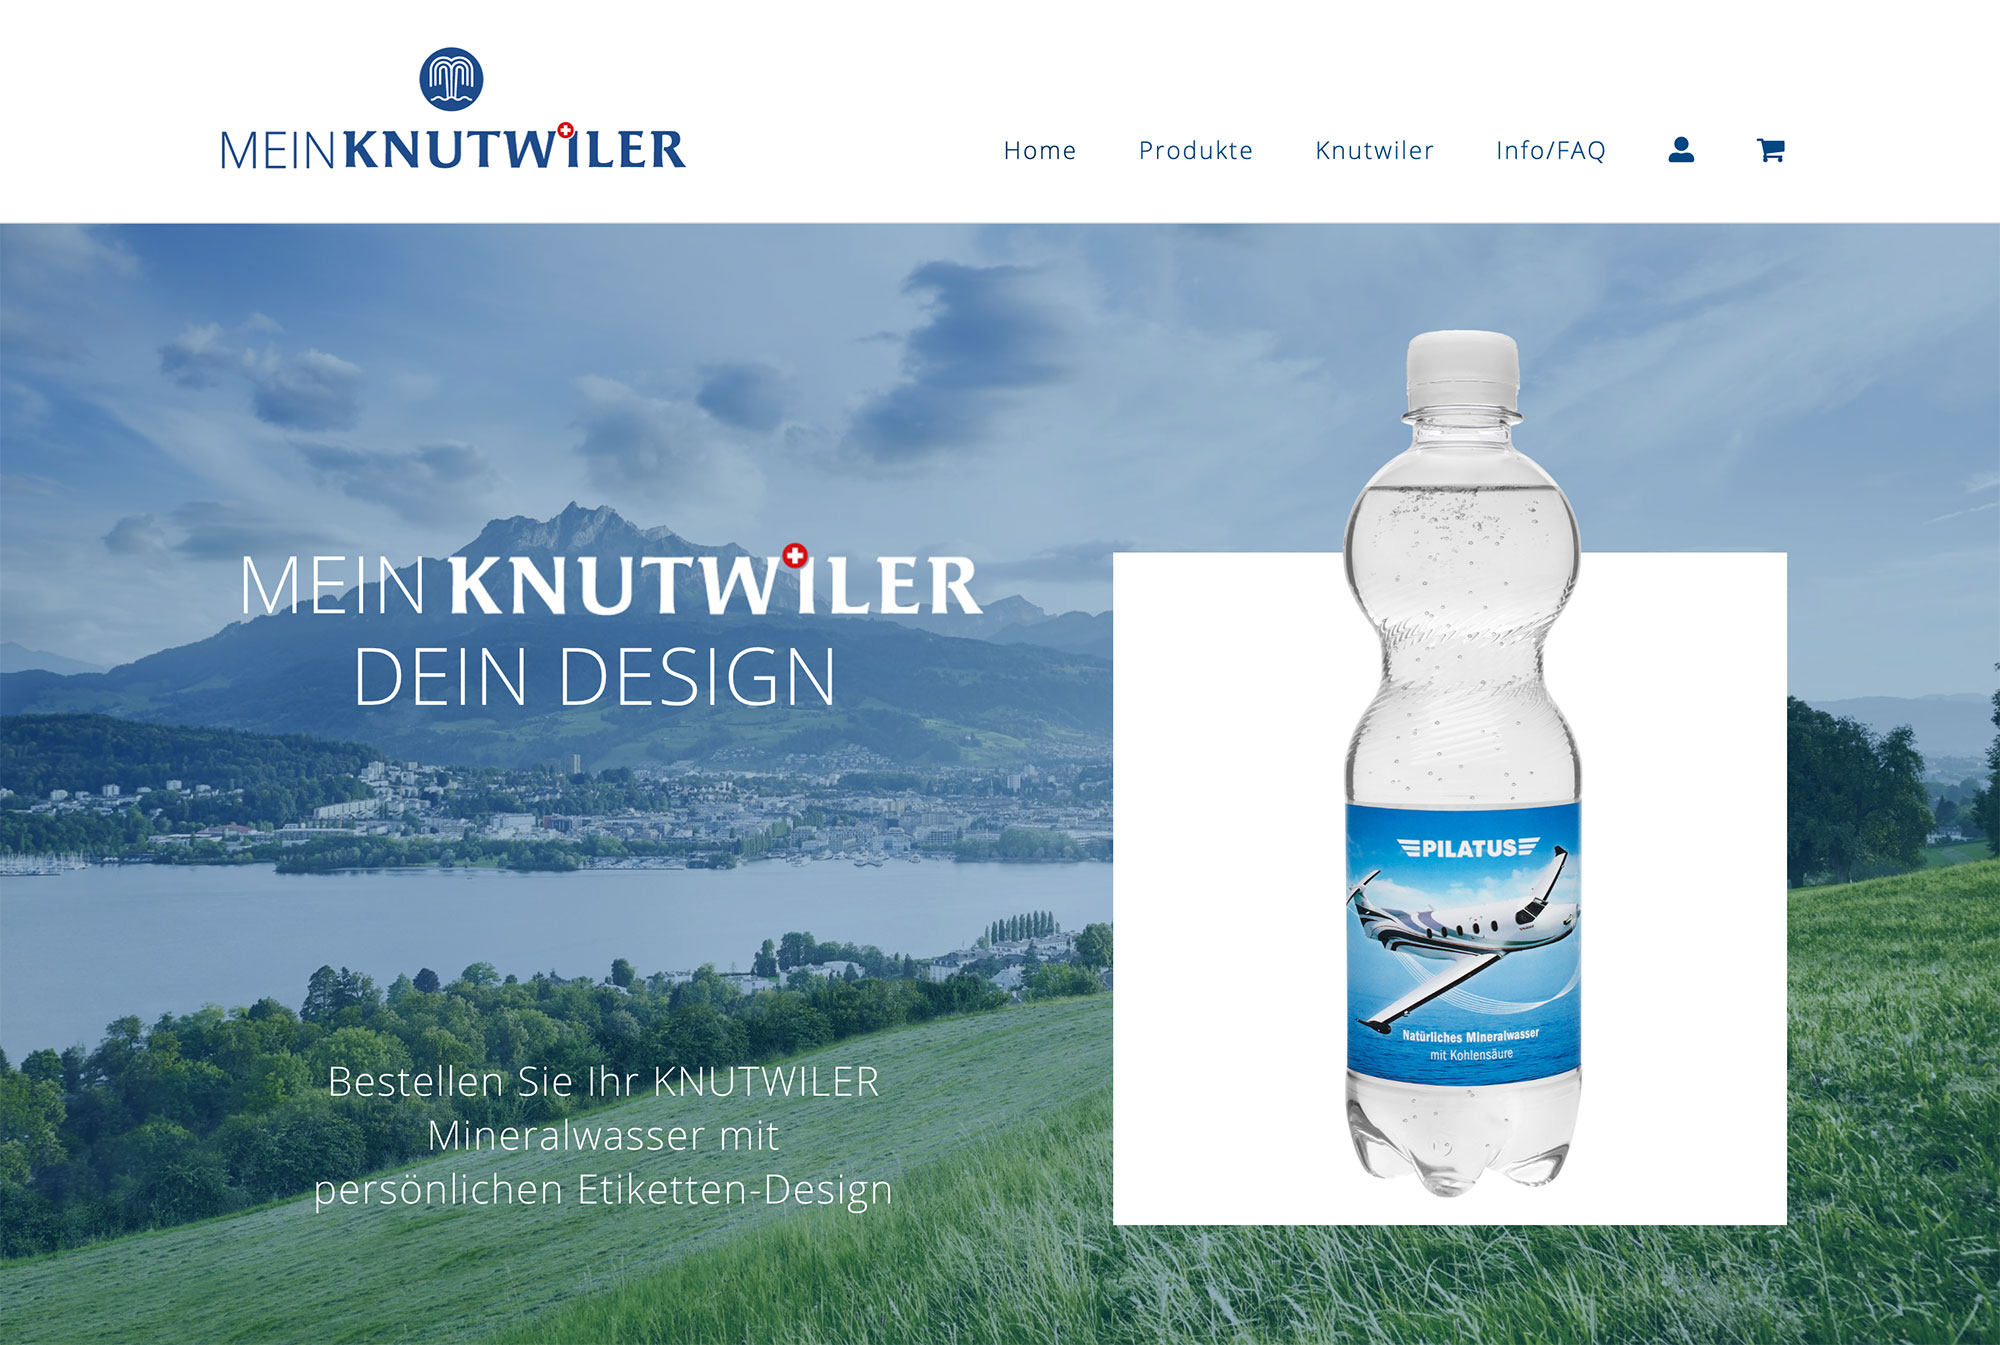 Portfolio | Screen Meinknutwiler